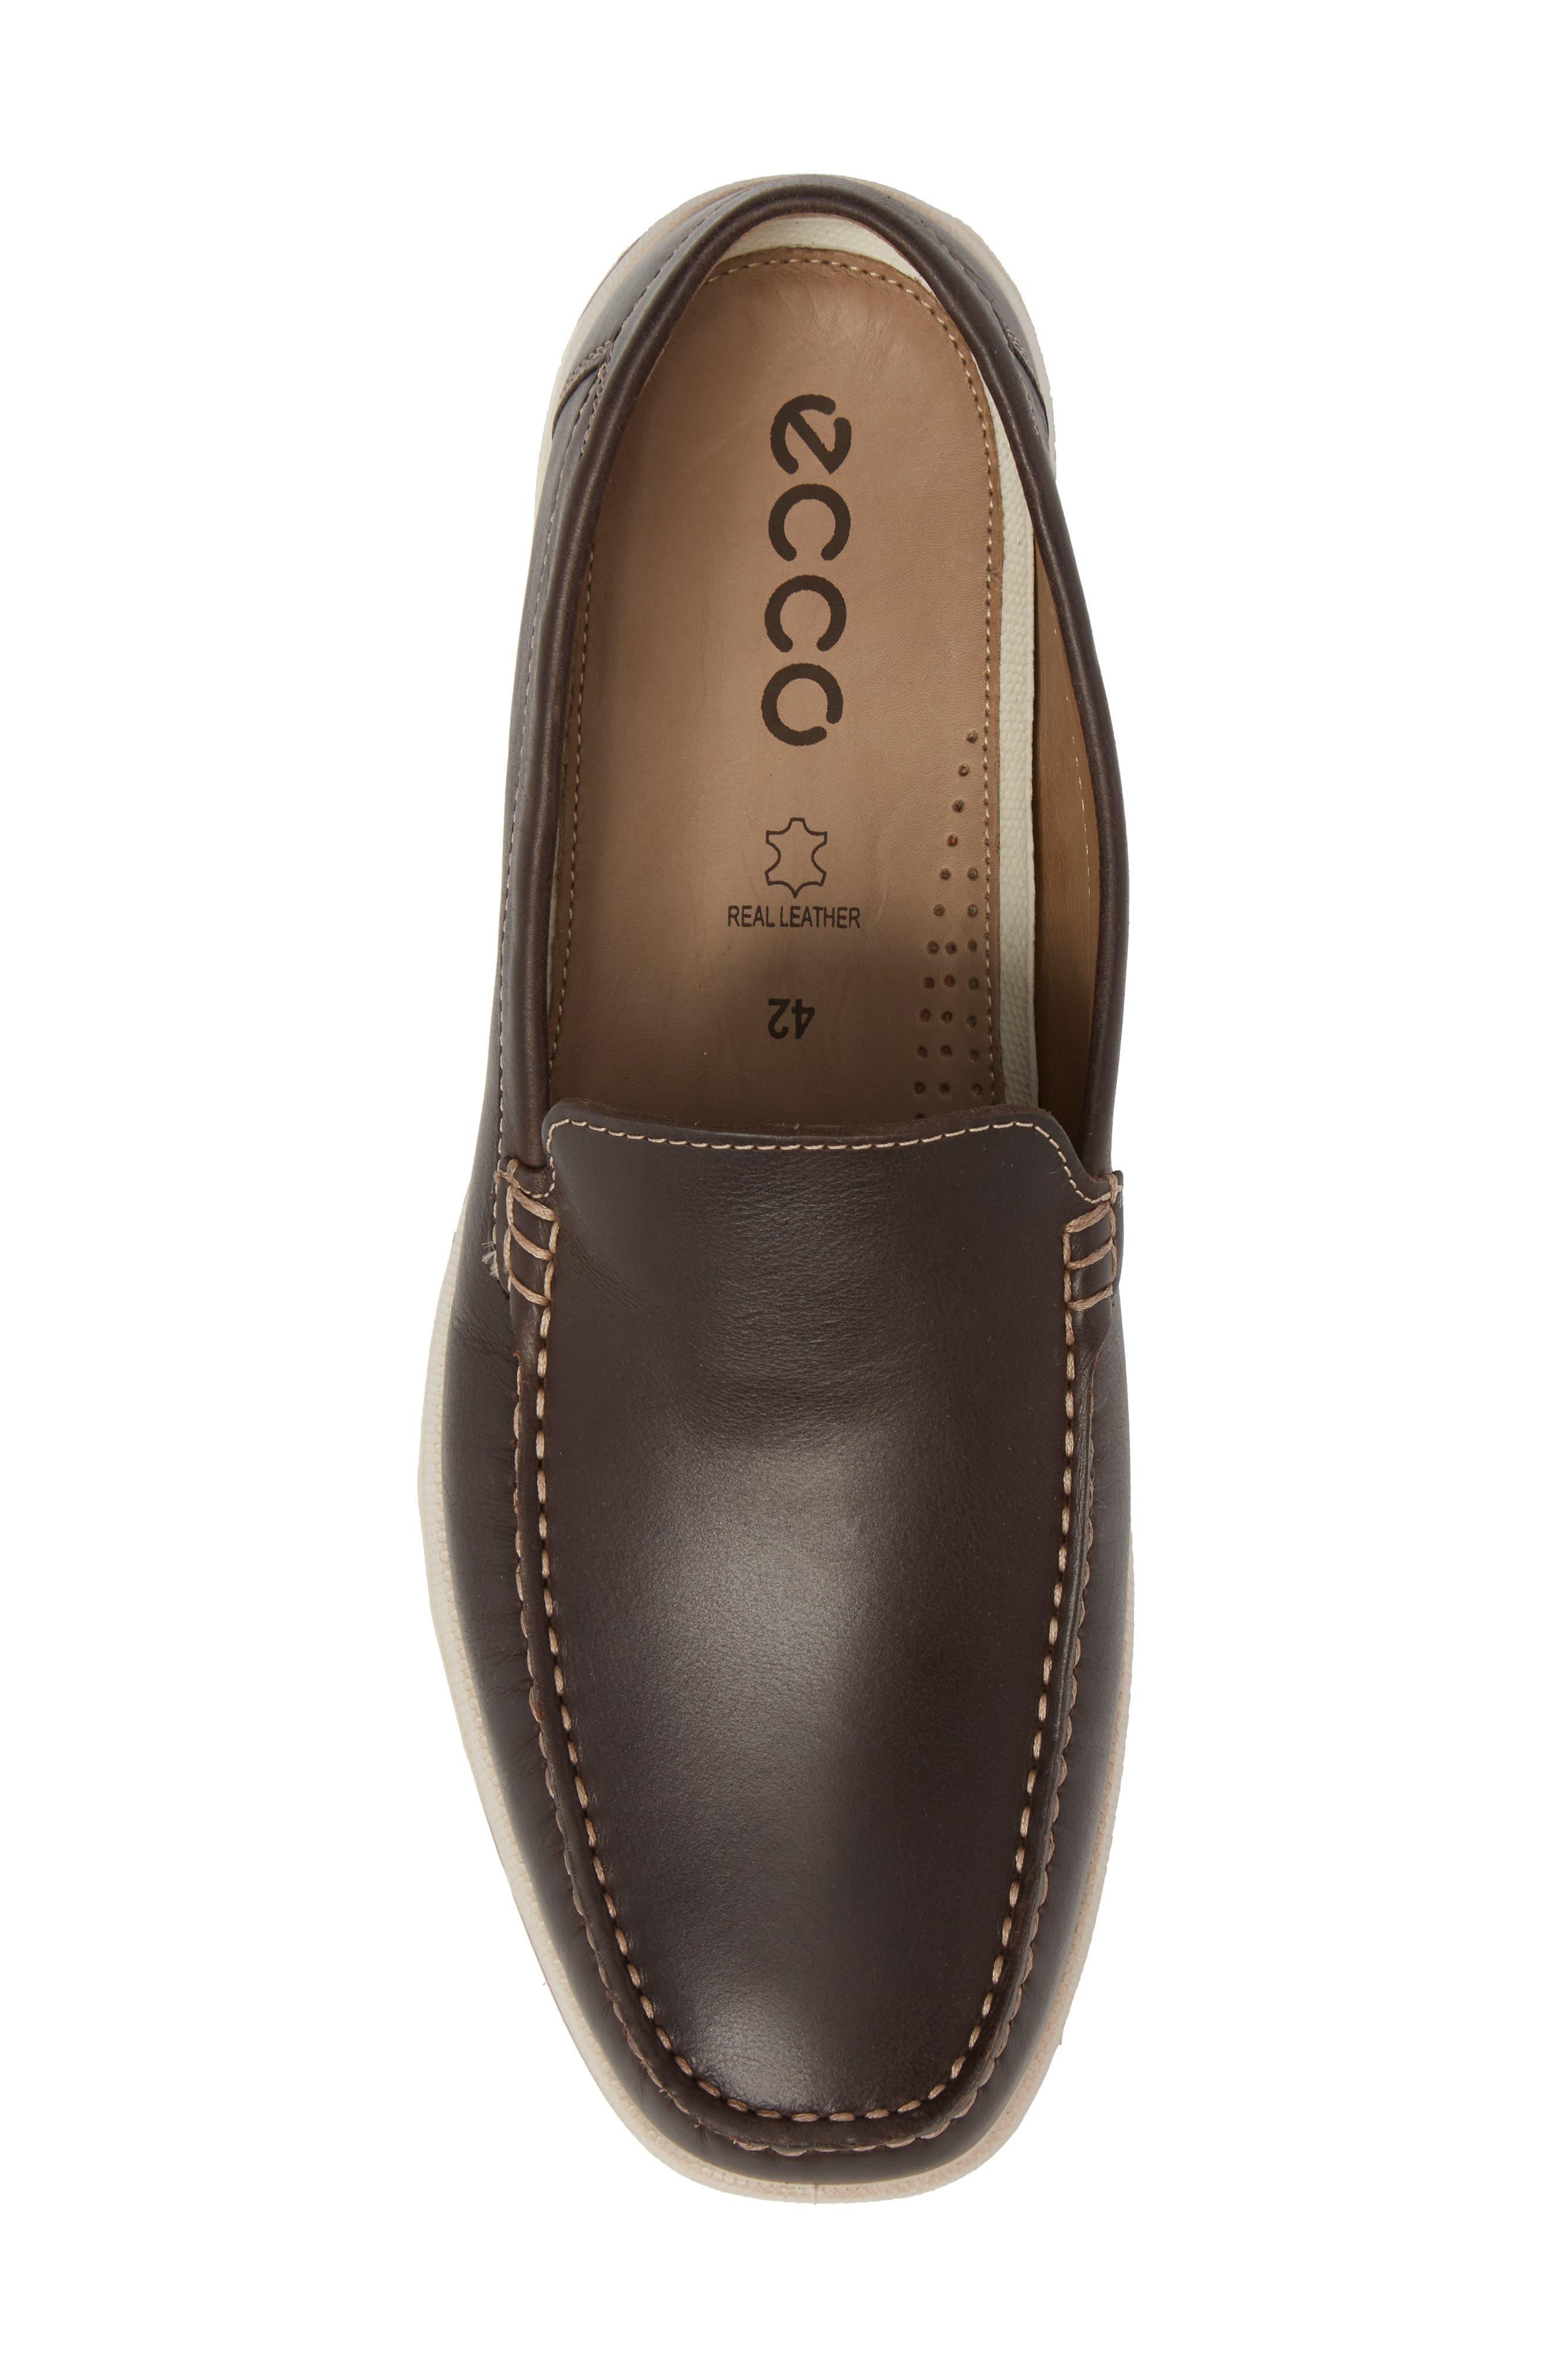 Dip Moc Toe Driving Loafer,                             Alternate thumbnail 5, color,                             Mocha Leather